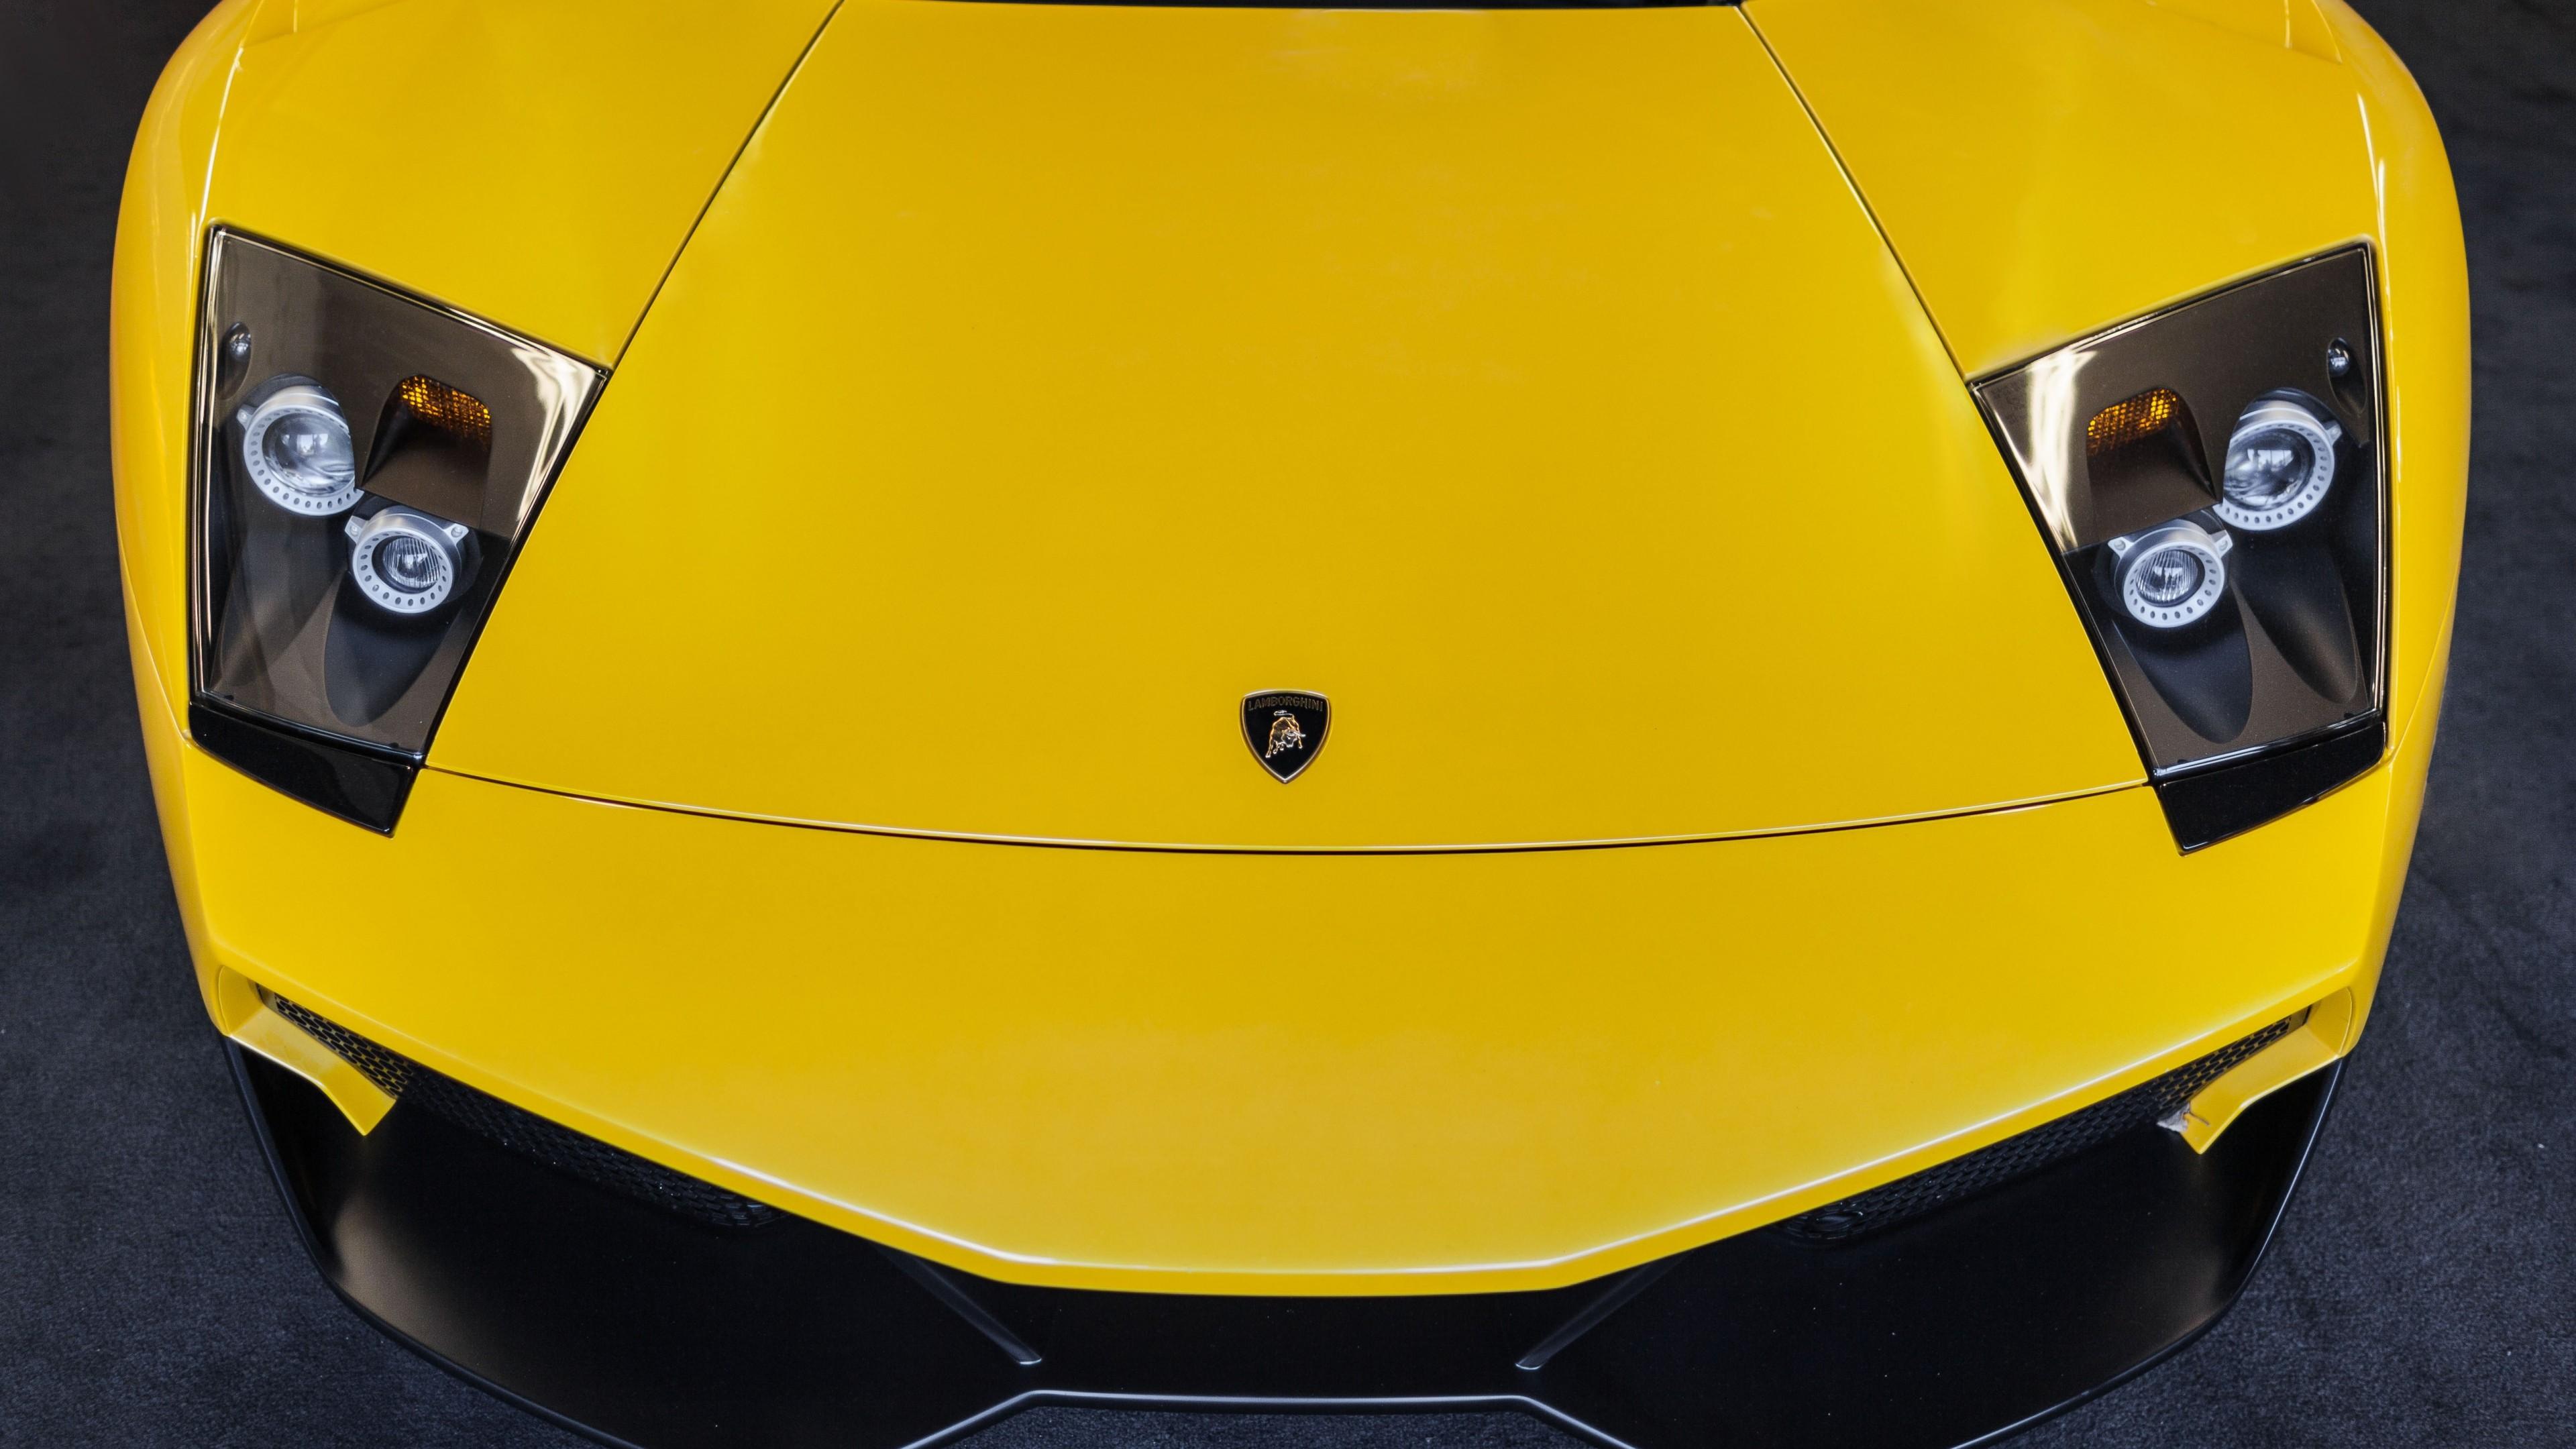 aston martin vanquish for rent with Lamborghini Murcielago Supercar Coupe Buy Review Rent 6923 on Louer Aston Martin Vanquish Volante furthermore 95 Cotes D Azur Luxury Cars as well Louer Aston Martin Vanquish Volante further Superkar 18132 in addition Louer Ferrari 458 Speciale.